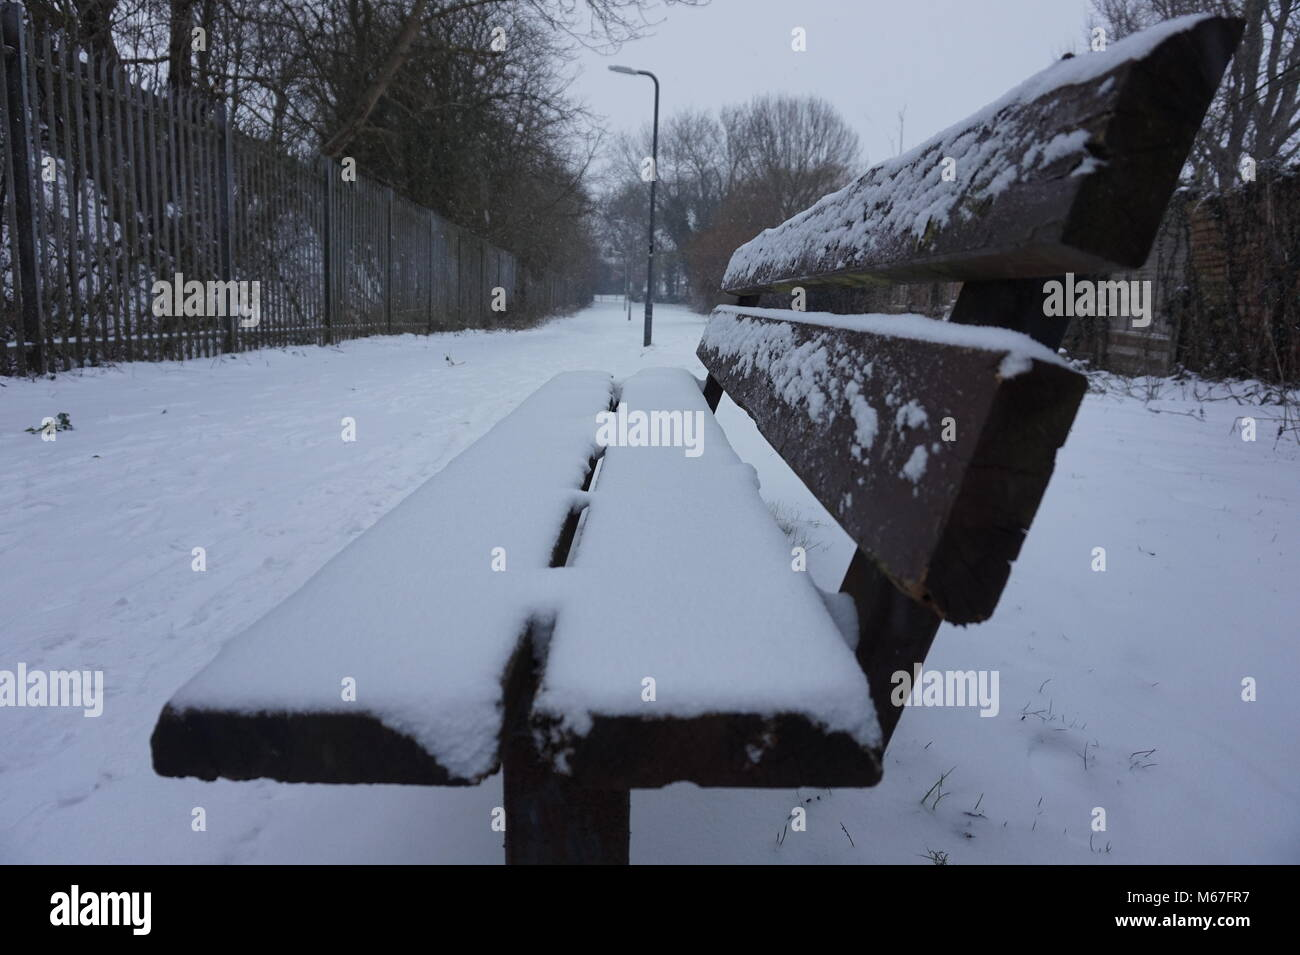 weather in milton keynes uk